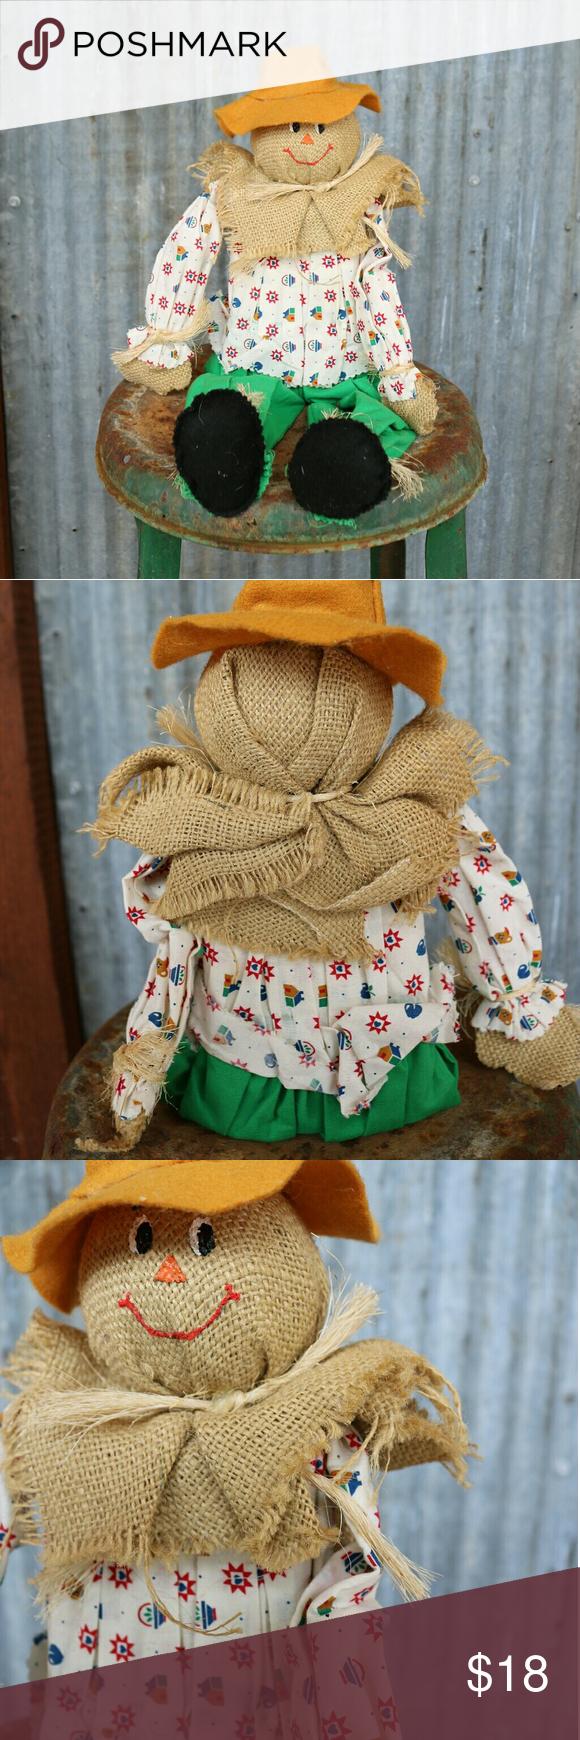 🍁FALL VINTAGE SCARECROW DECOR🍁 🍁Sweetie homemade vintage scarecrow. …